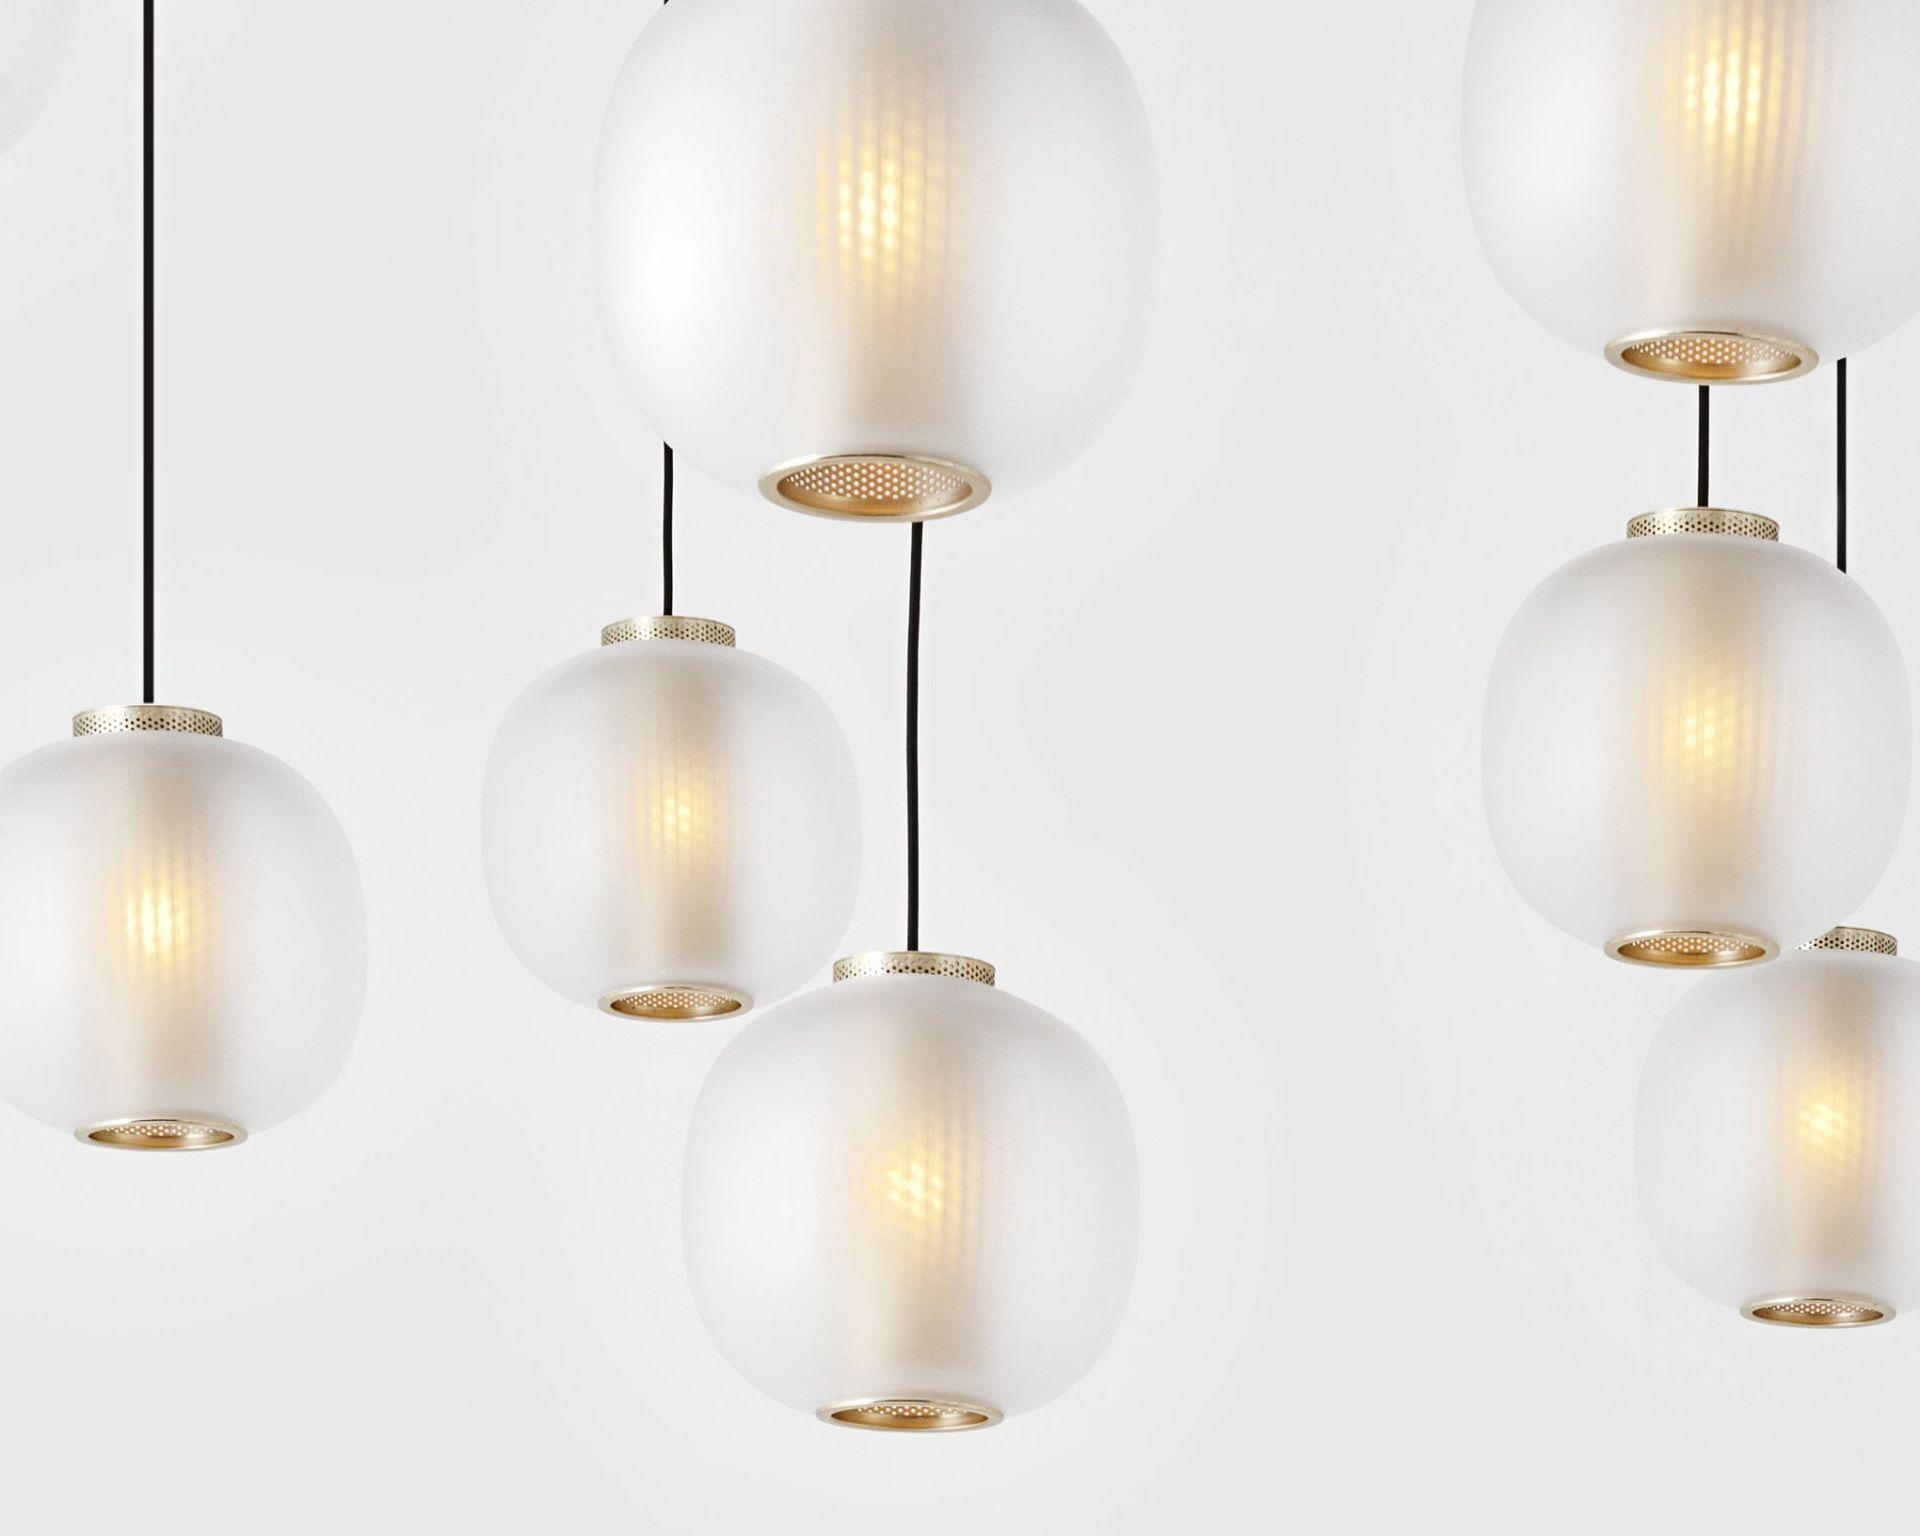 euroluce 2017 resident bloom circus eikelenboom design verlichting hanglampen 3